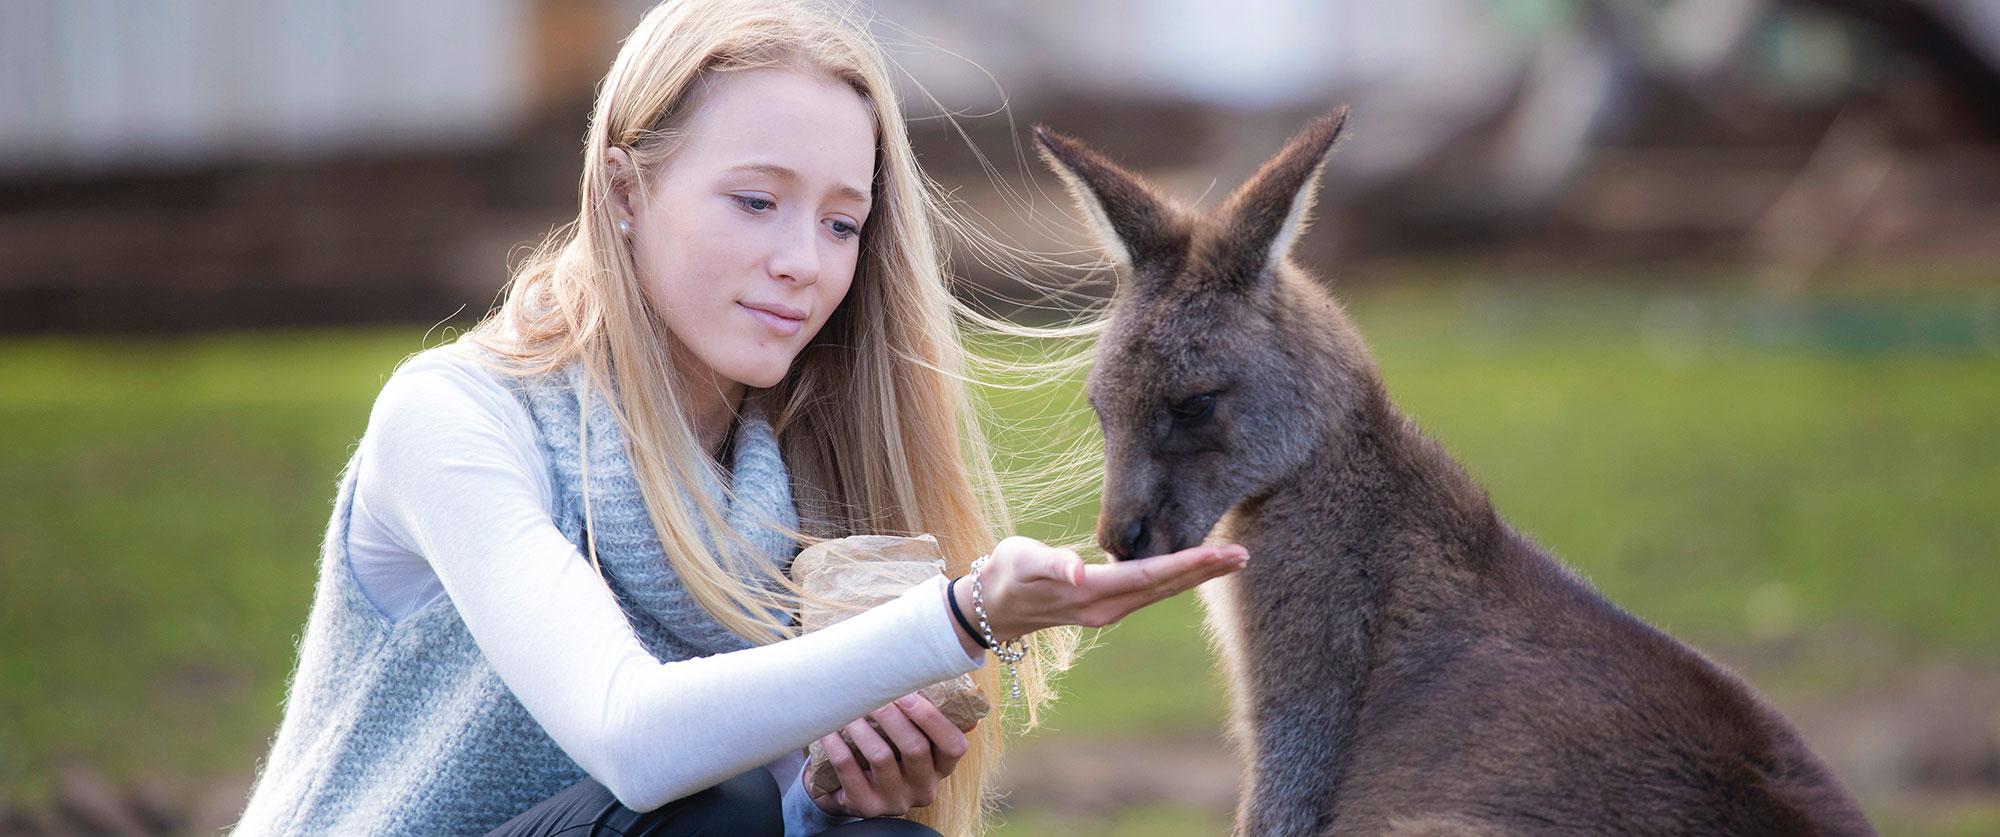 Australia Wildlife Vacations - Bonorong Wildlife Sanctuary Tasmania